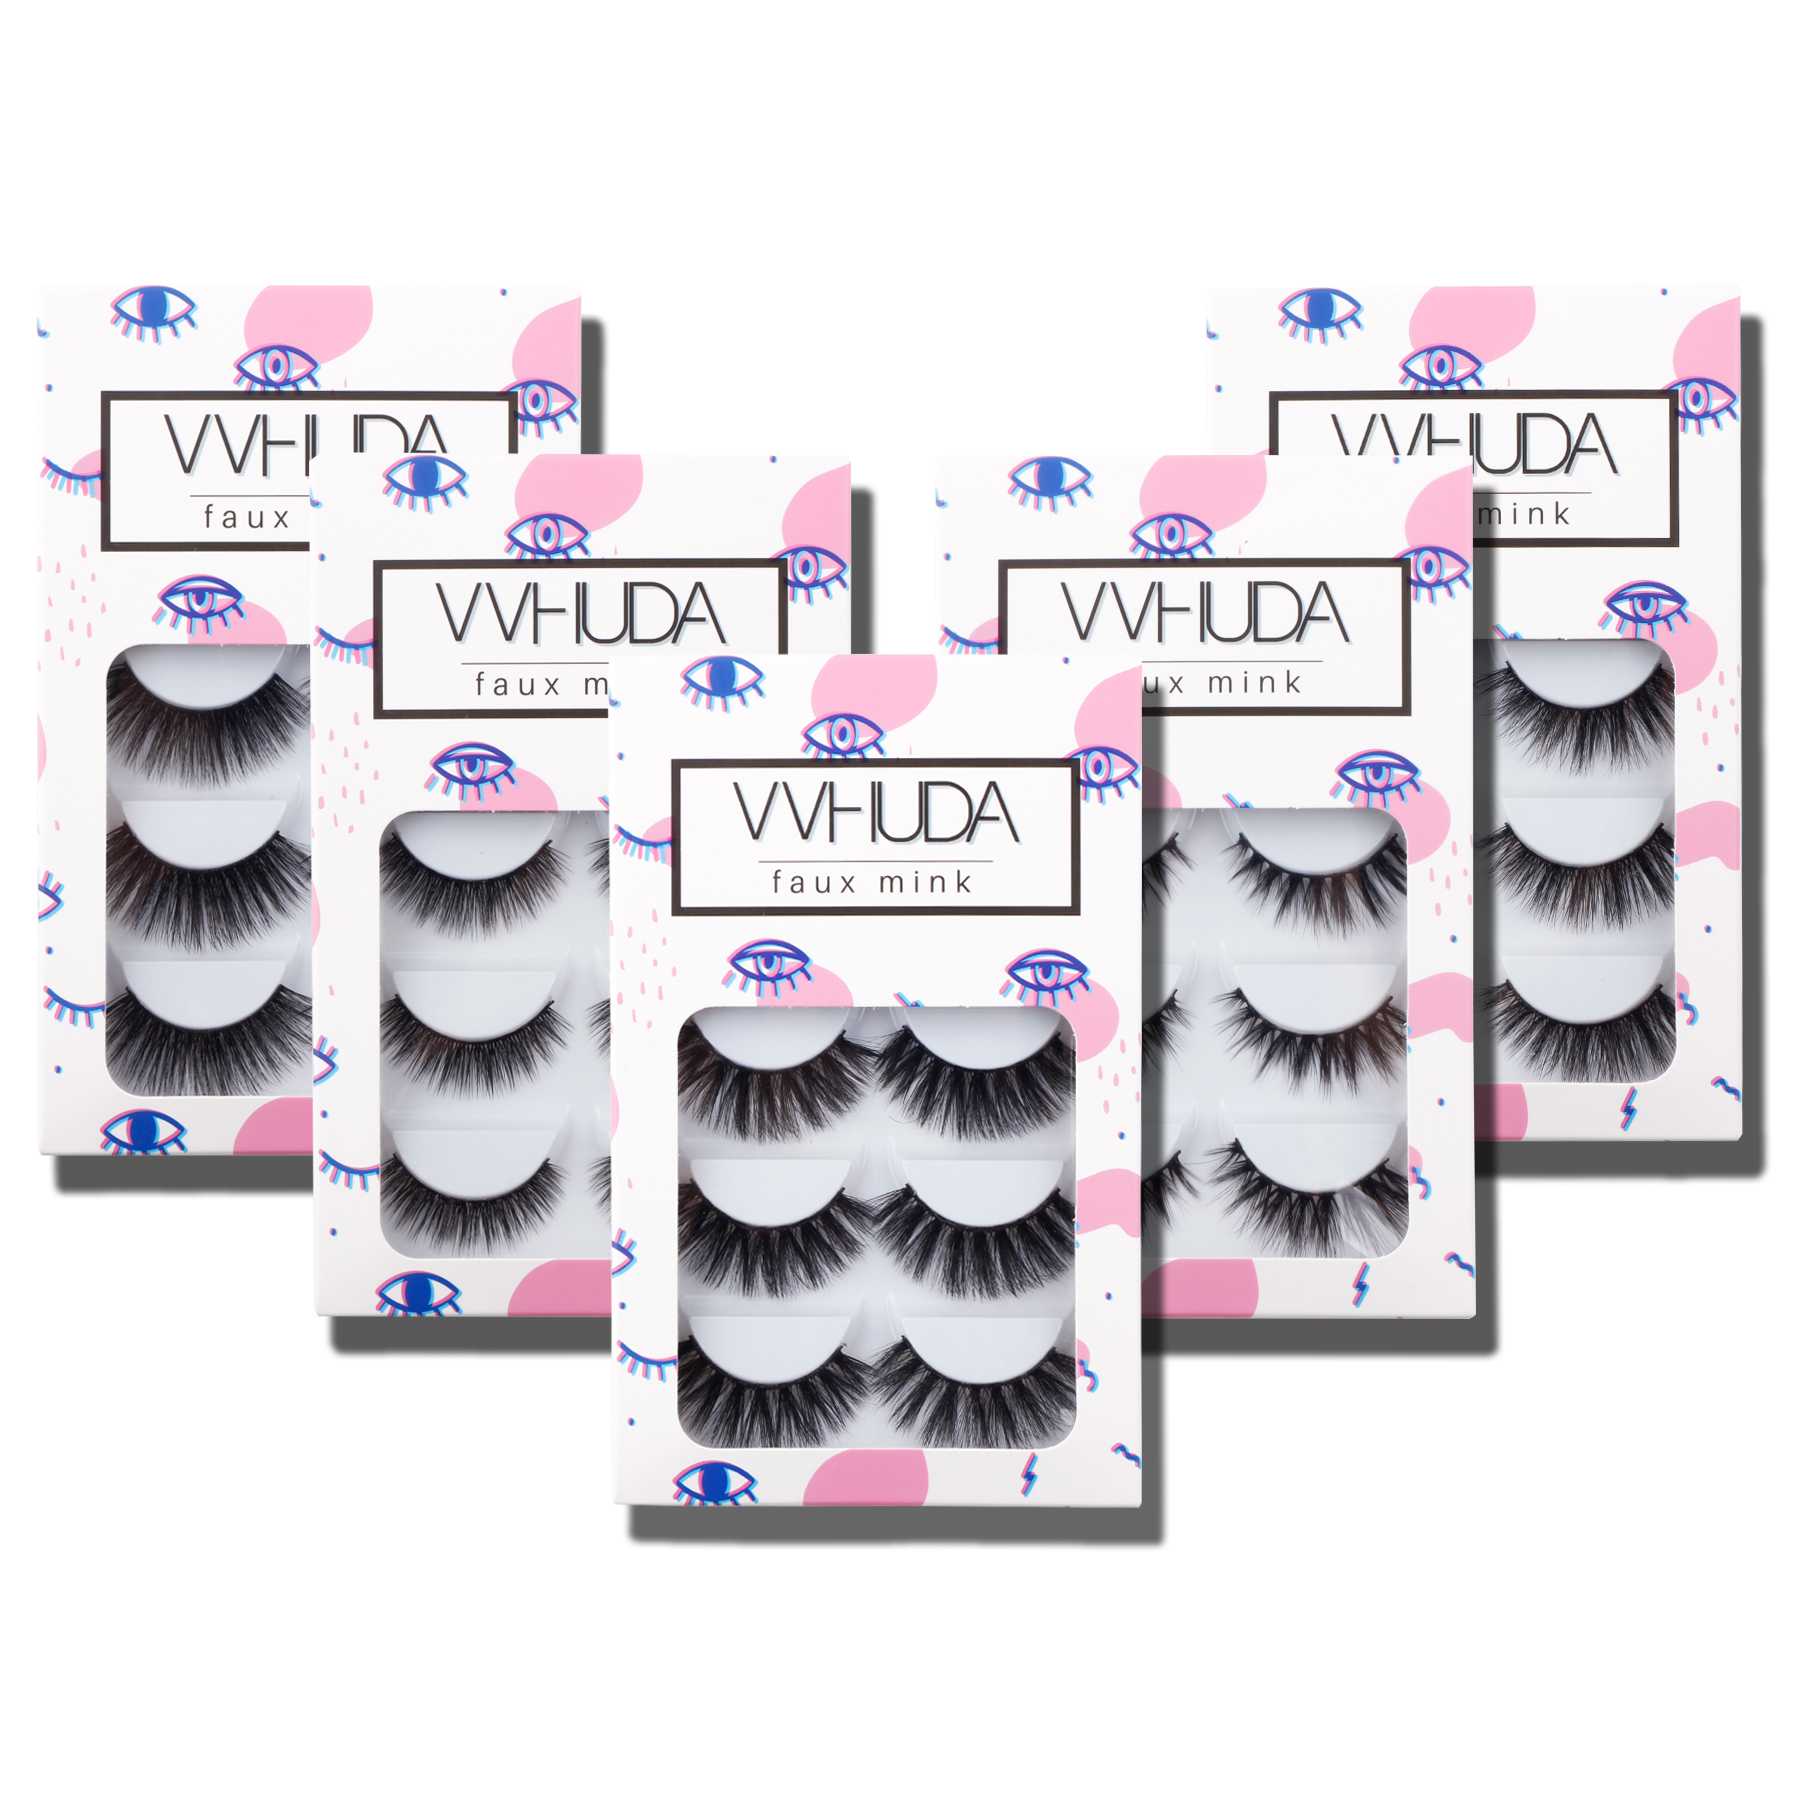 VVHUDA Faux Mink Eyelashes Demi Wispies Super-soft Tapered Fiber 5Pair Volume Reusable Premium Extension Eye Fur Lashes Fluttery